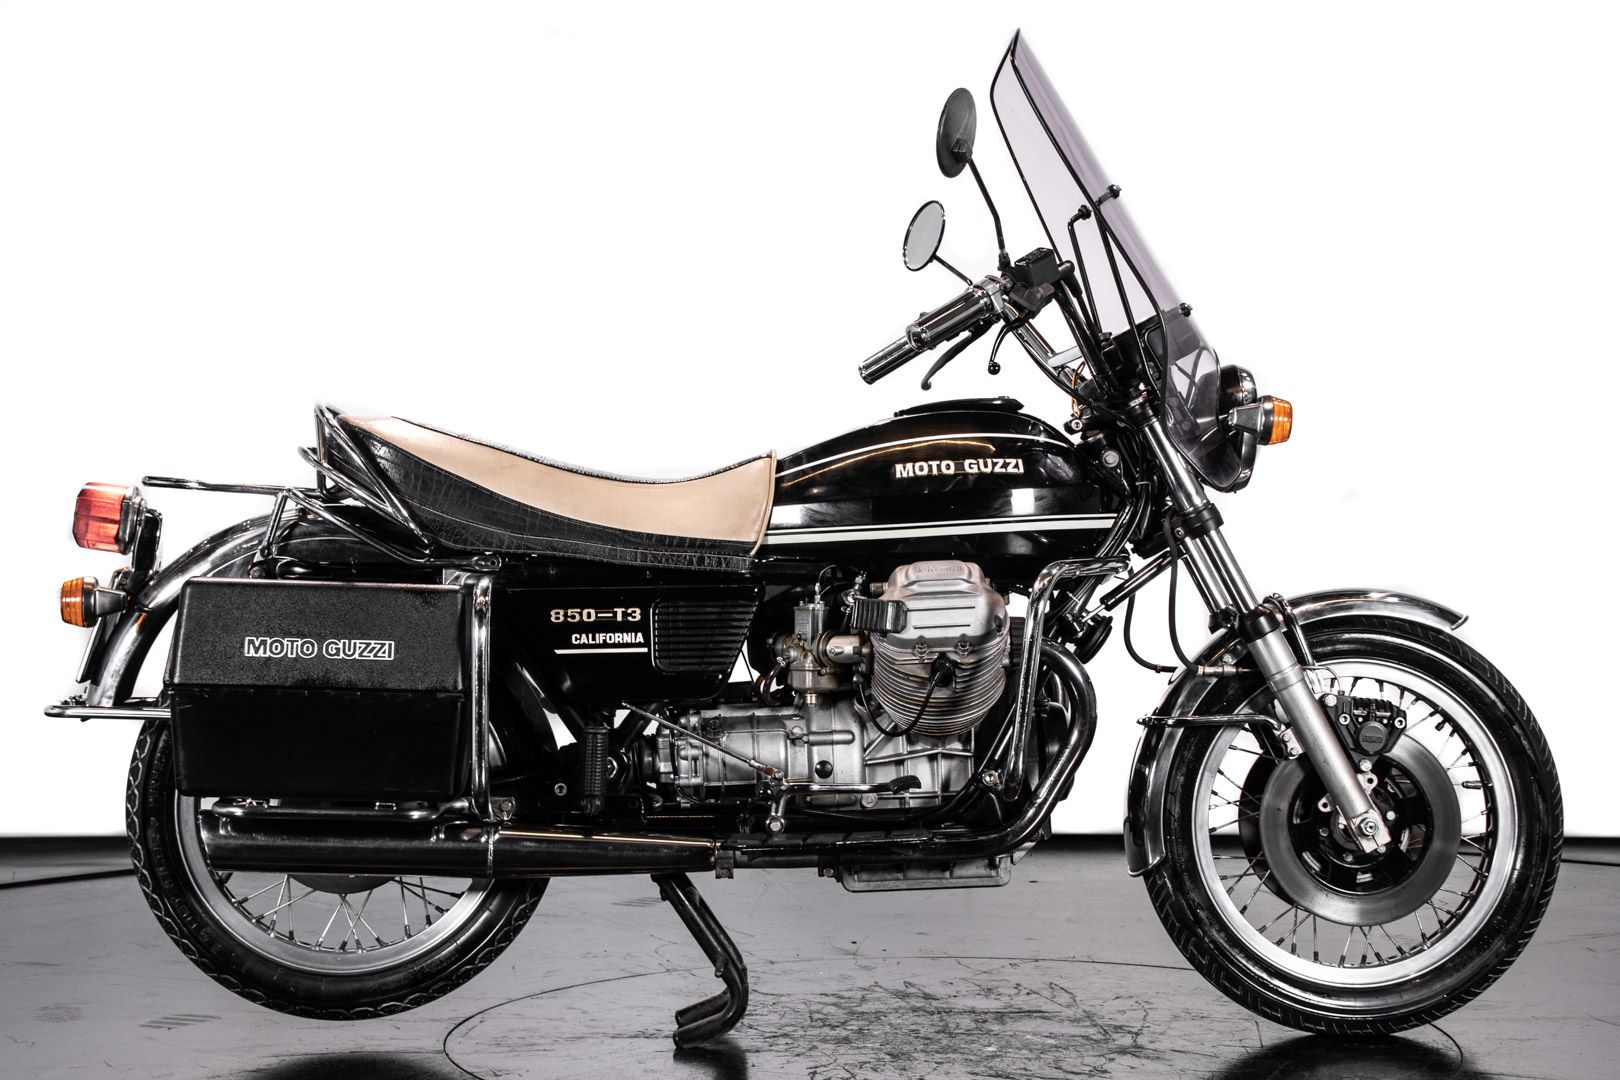 1981 Moto Guzzi 850 T3 California 83244